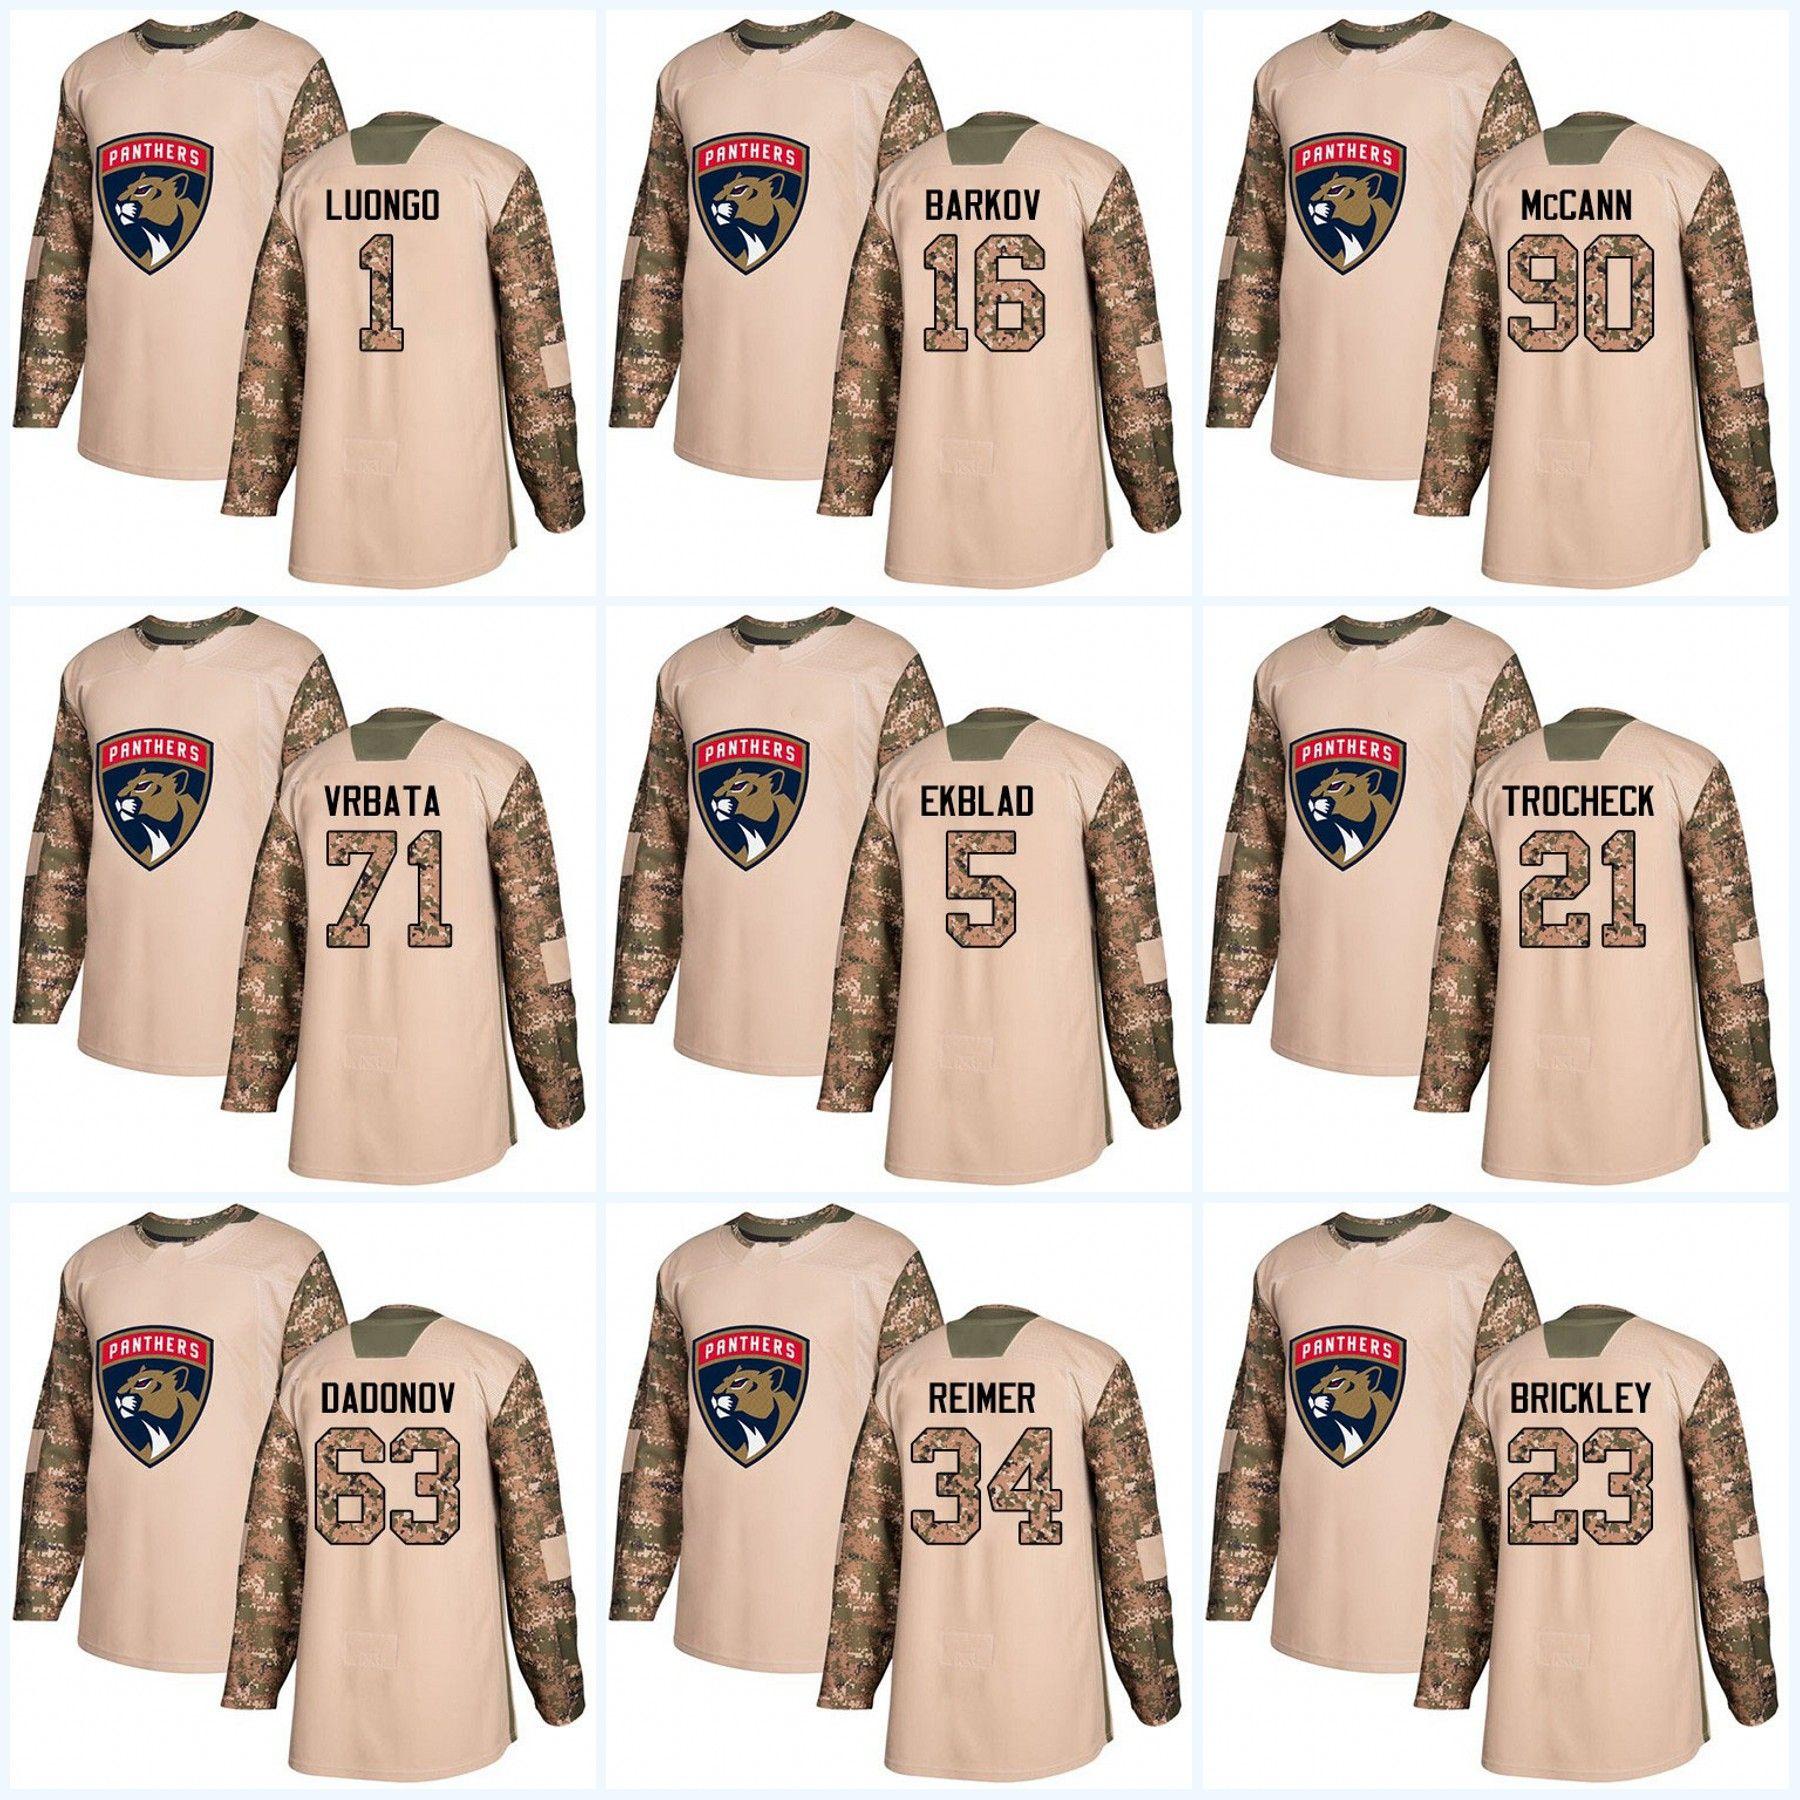 new style 480c5 f3c55 Youth 2017 Camo Veterans Day Florida Panthers 1 Roberto Luongo Aaron Ekblad  Aleksander Barkov Micheal Haley Radim Vrbata Hockey jerseys